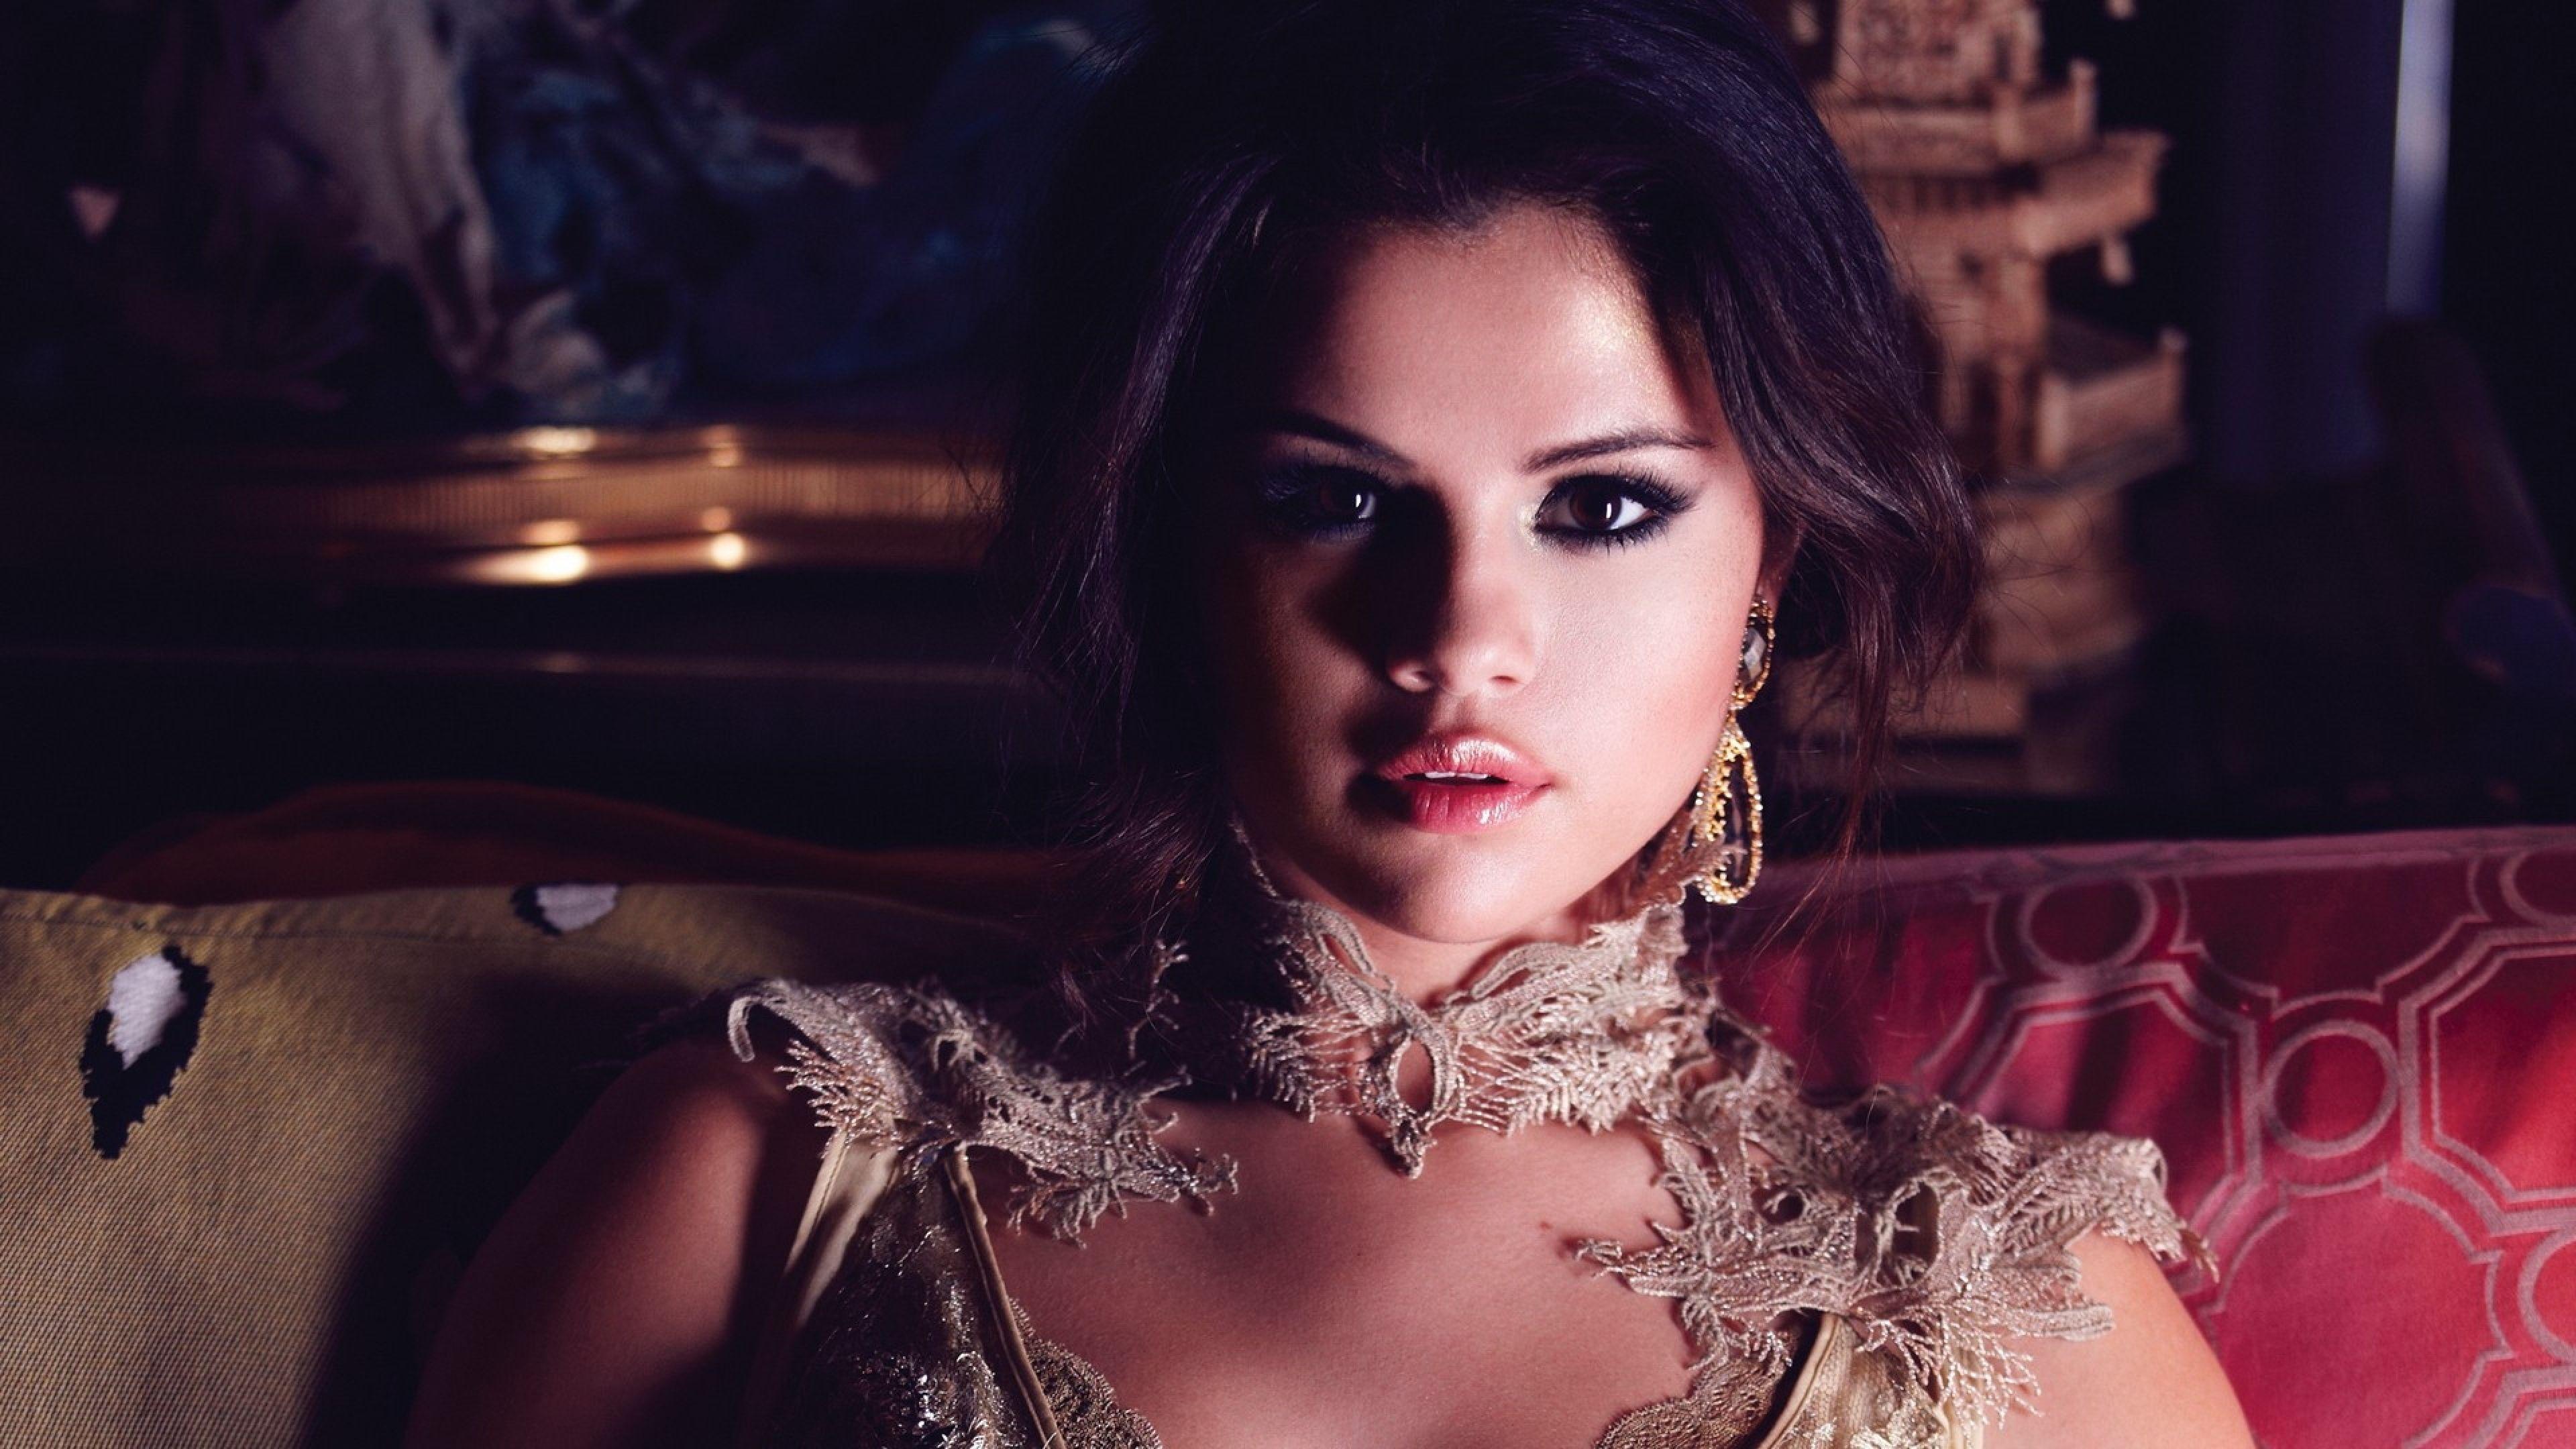 selena gomez 4k latest 1536946057 - Selena Gomez 4k Latest - selena gomez wallpapers, music wallpapers, hd-wallpapers, girls wallpapers, celebrities wallpapers, 4k-wallpapers